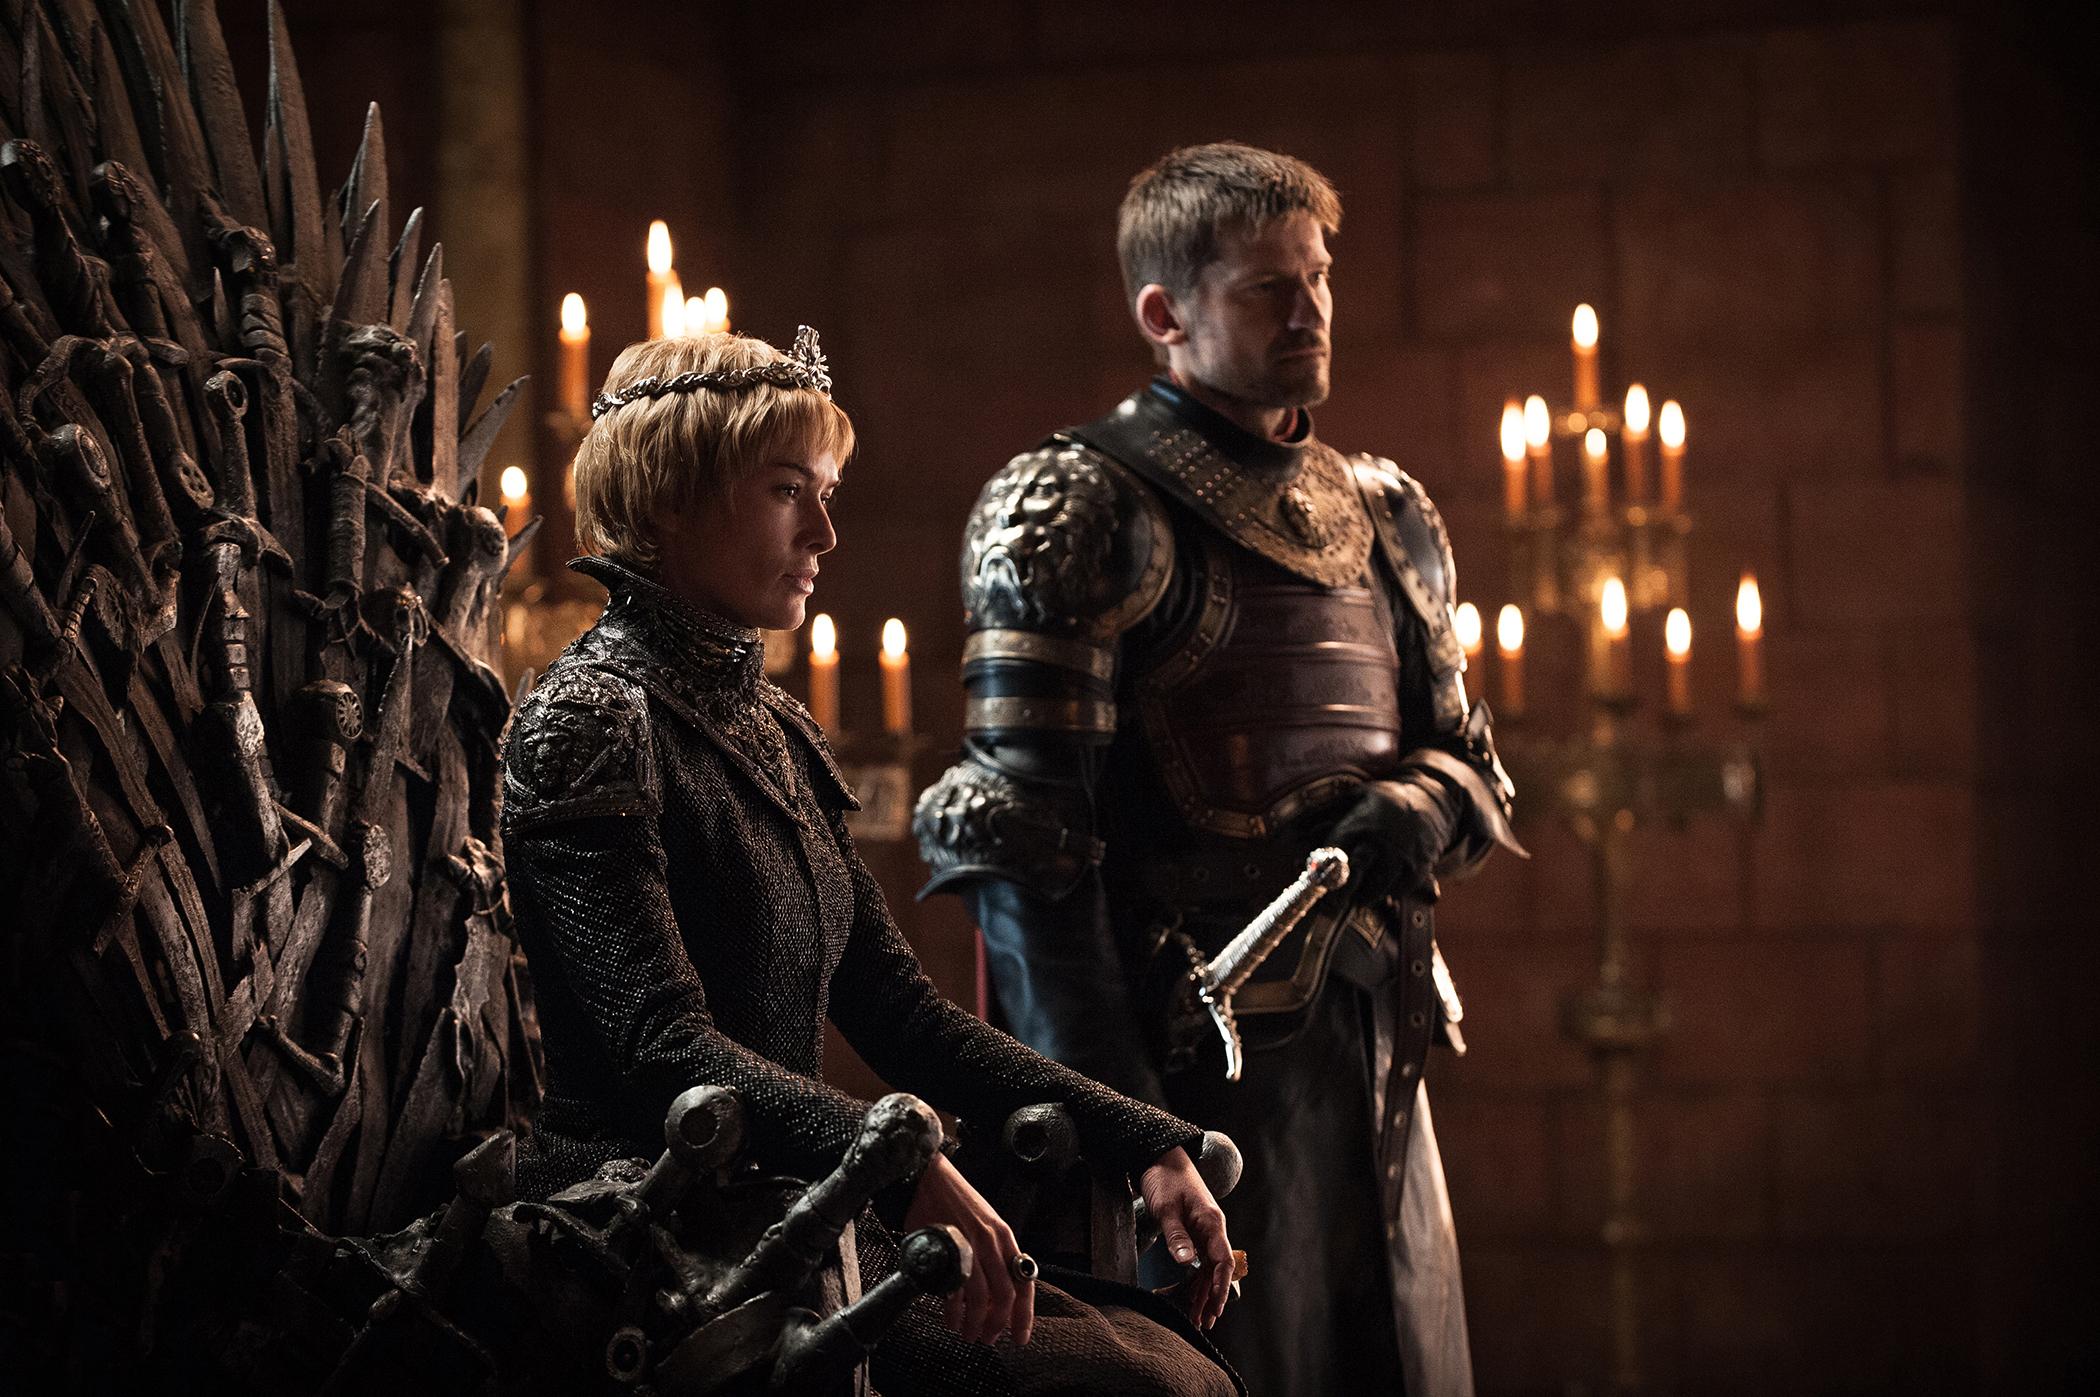 Image: Game of Thrones Season 7 still; Lena Headey, Nikolaj Coster-Waldau.